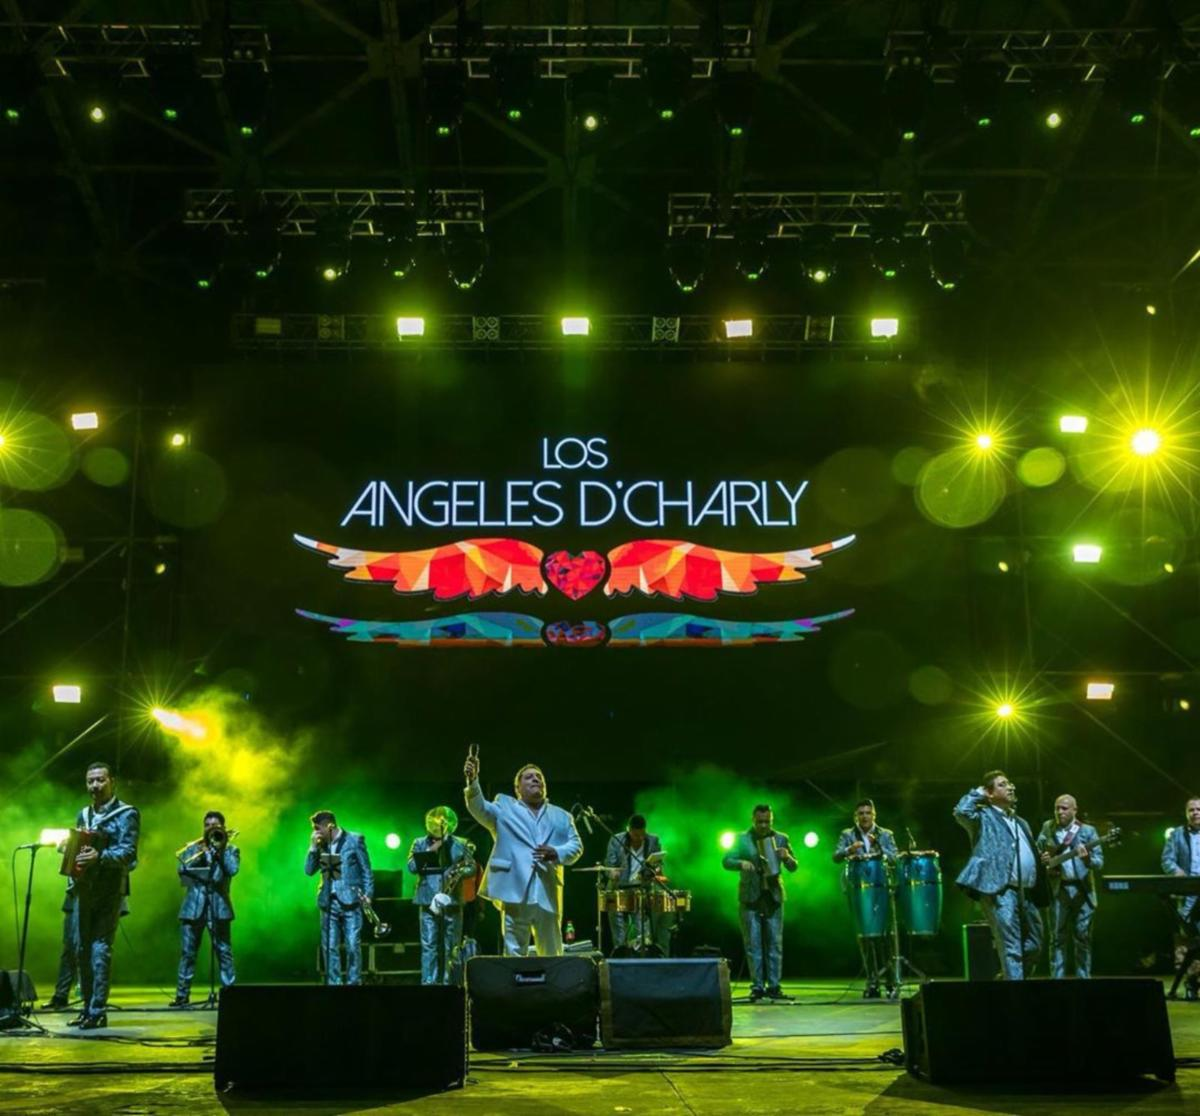 Los Angeles De Charly - Tour